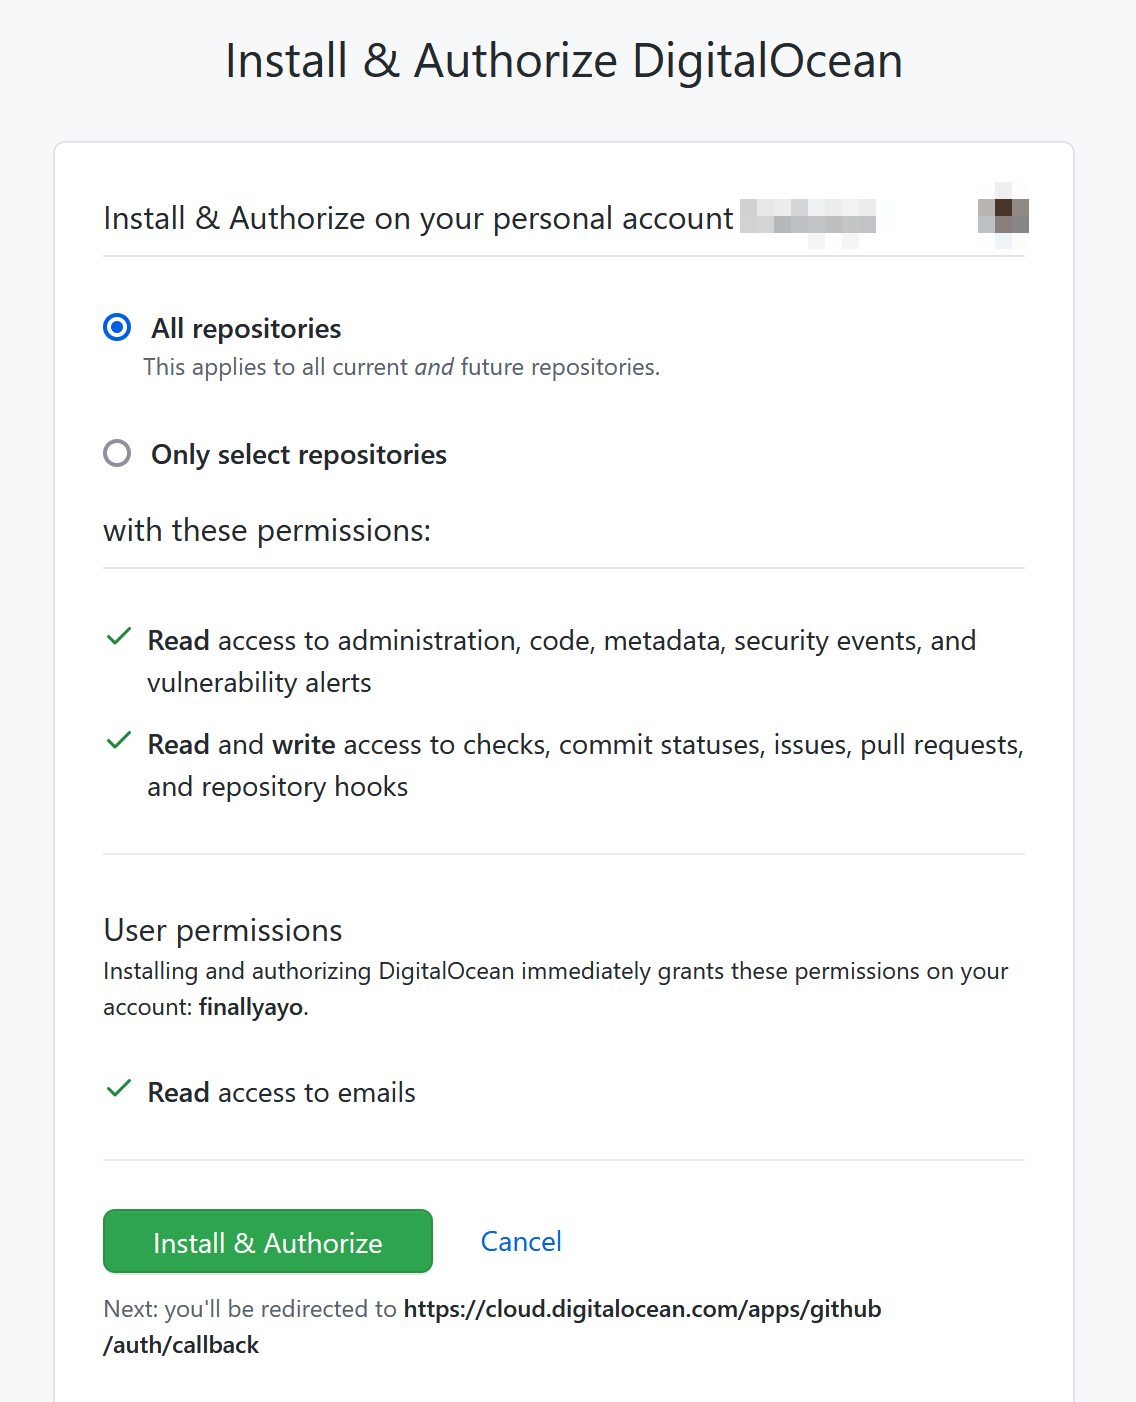 Install and Authorize DigitalOcean on GitHub